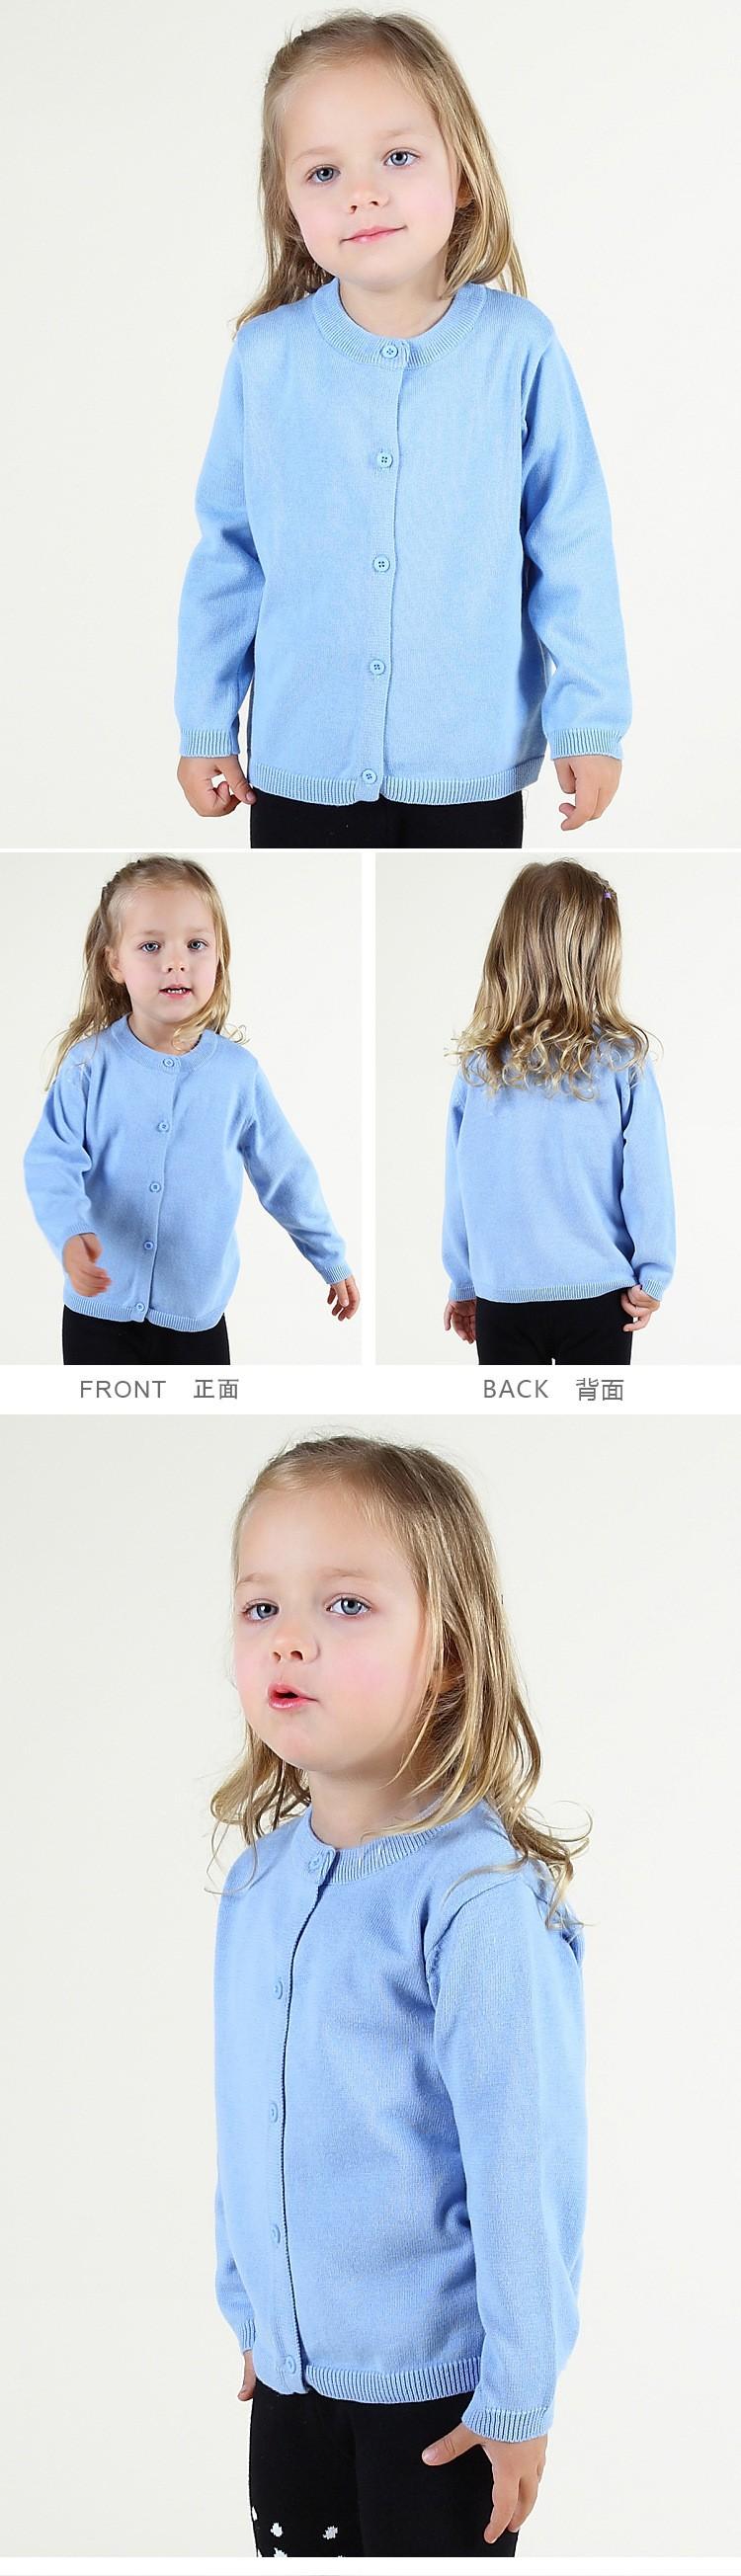 5cd3cc1fc 2016 BBW style autumn winter cotton knitted cardigan baby boys girls ...